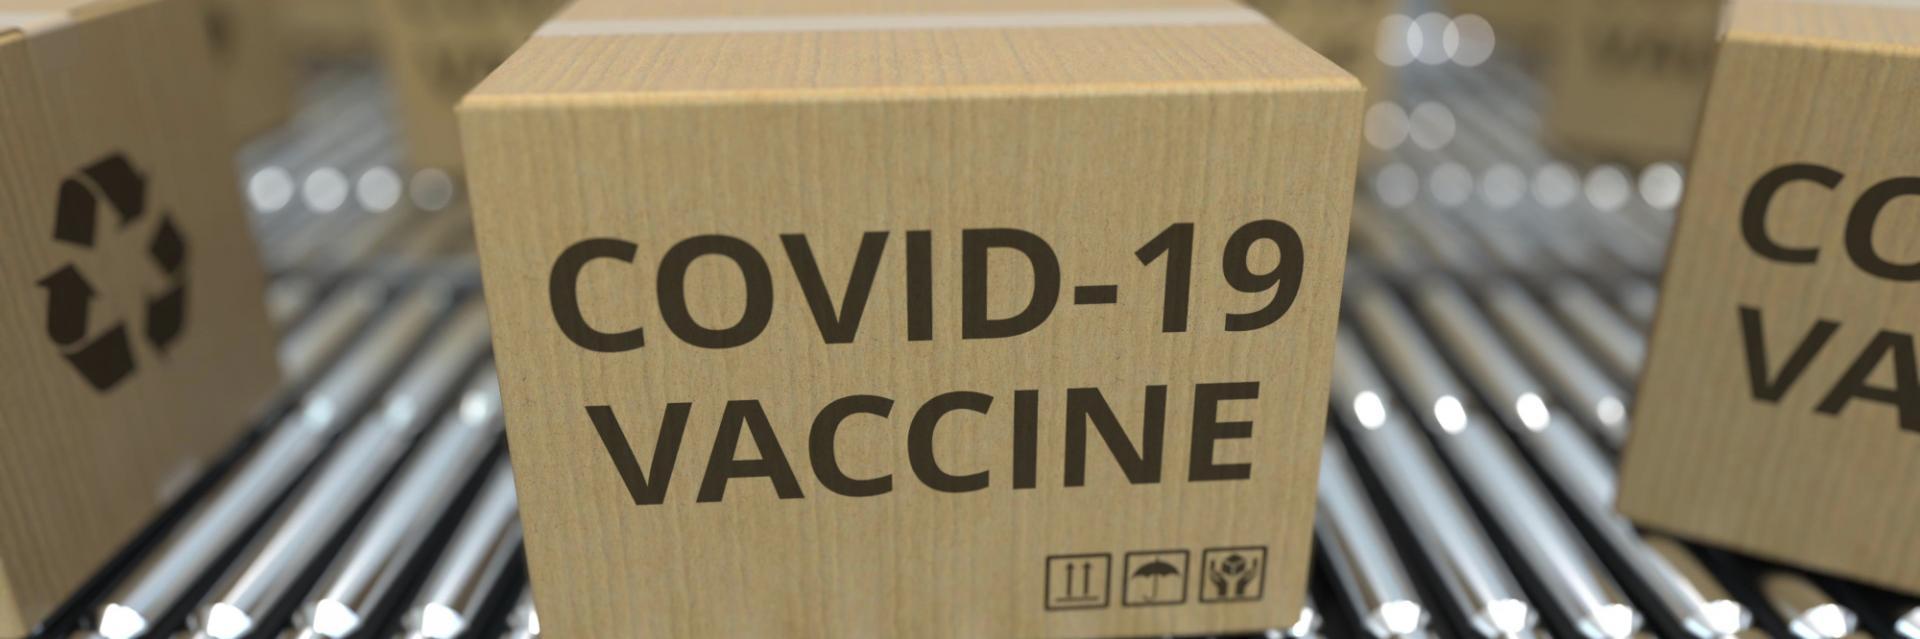 129,600 doses of Johnson & Johnson COVID-19 vaccines delivered to Zambia